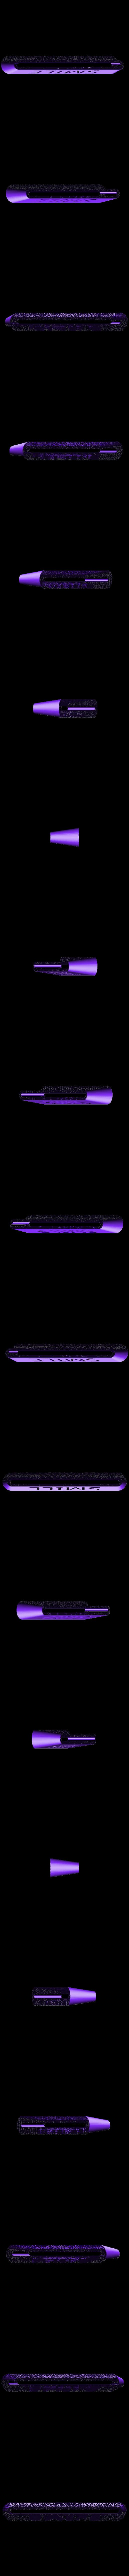 SACA_PASTA_SMILE.stl Download free STL file Toothpaste squeezer • 3D printable model, JPool